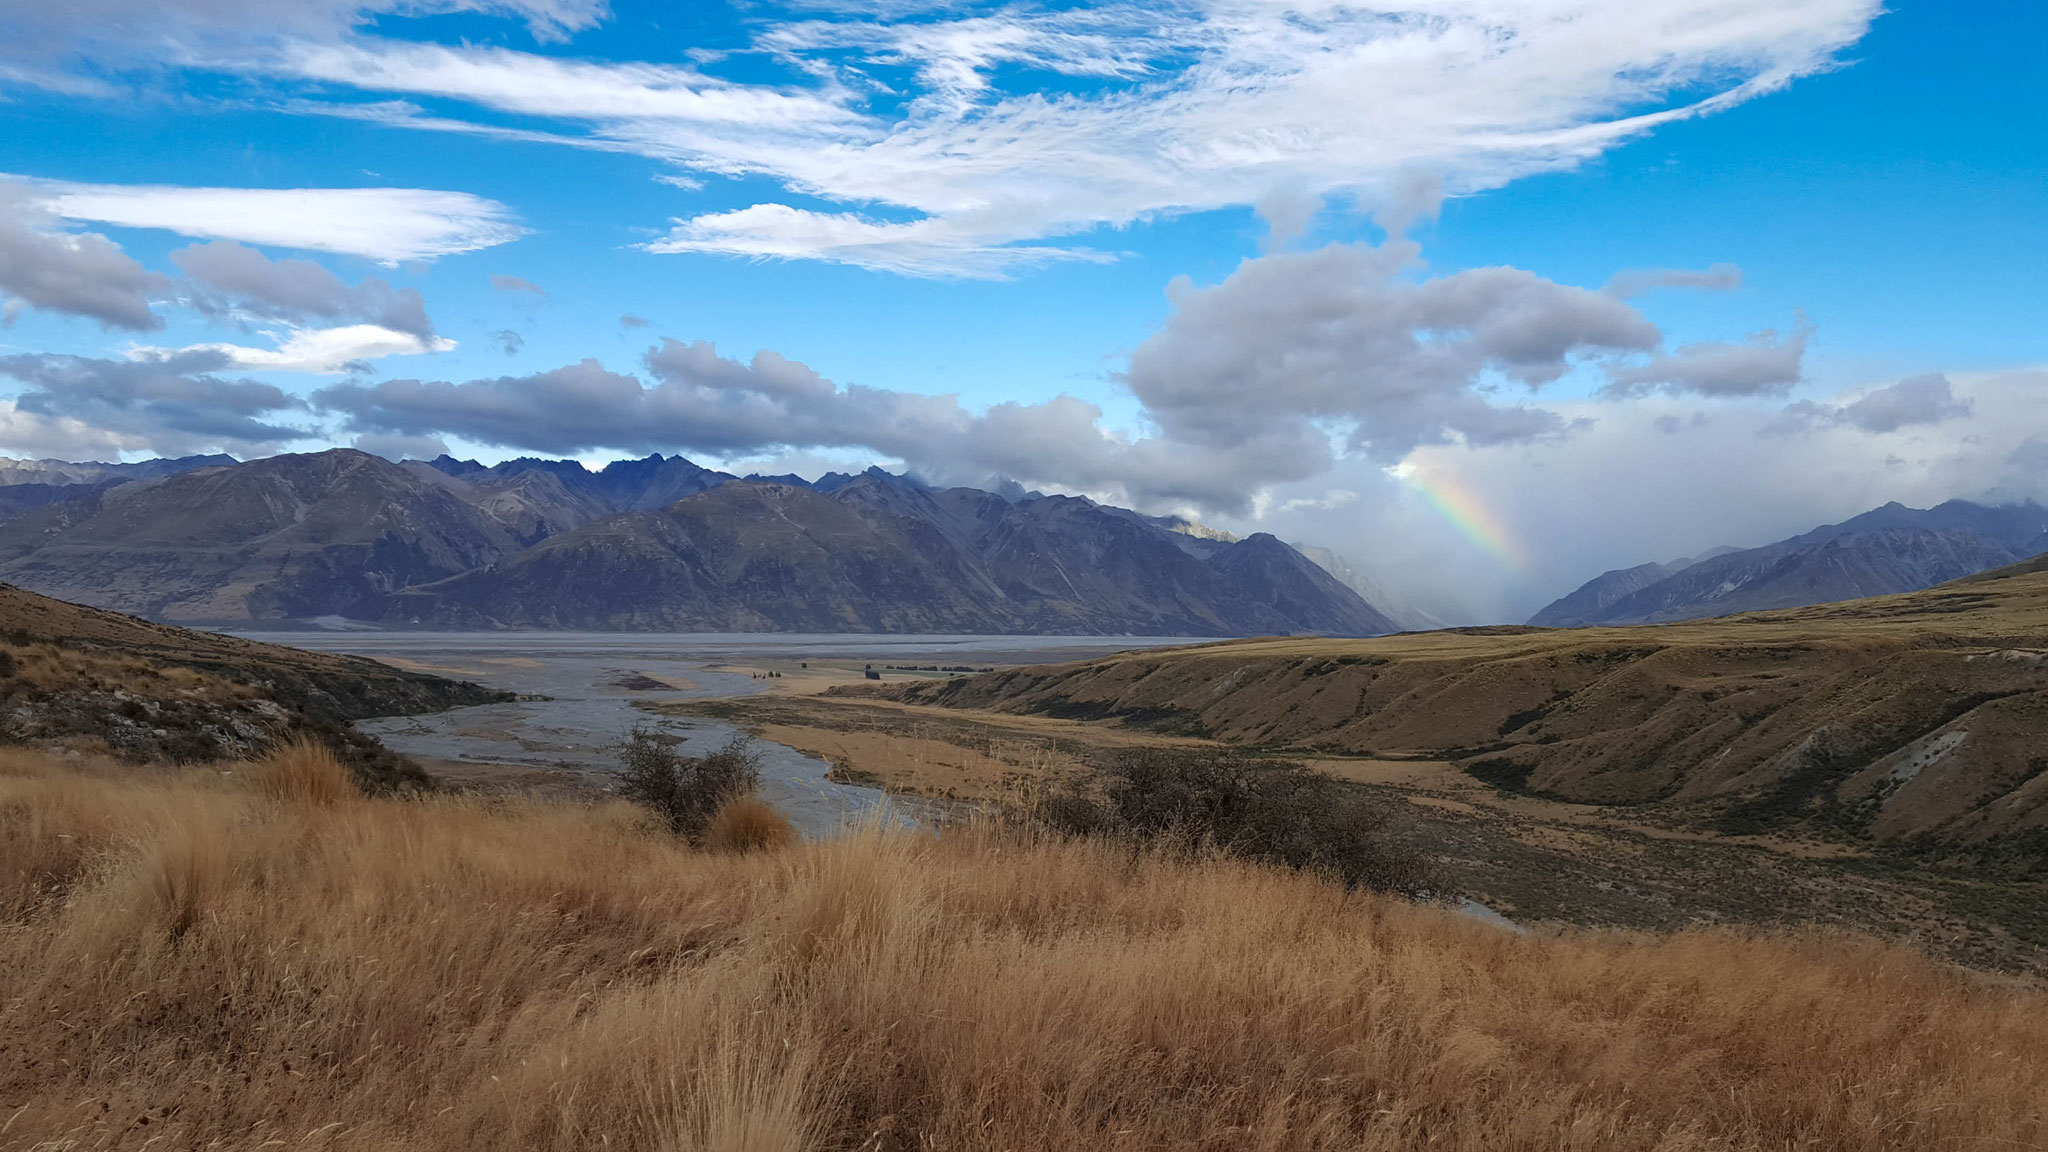 Te Araroa starker Regen in der Main Divide und dem Ursprung des Rangitata River